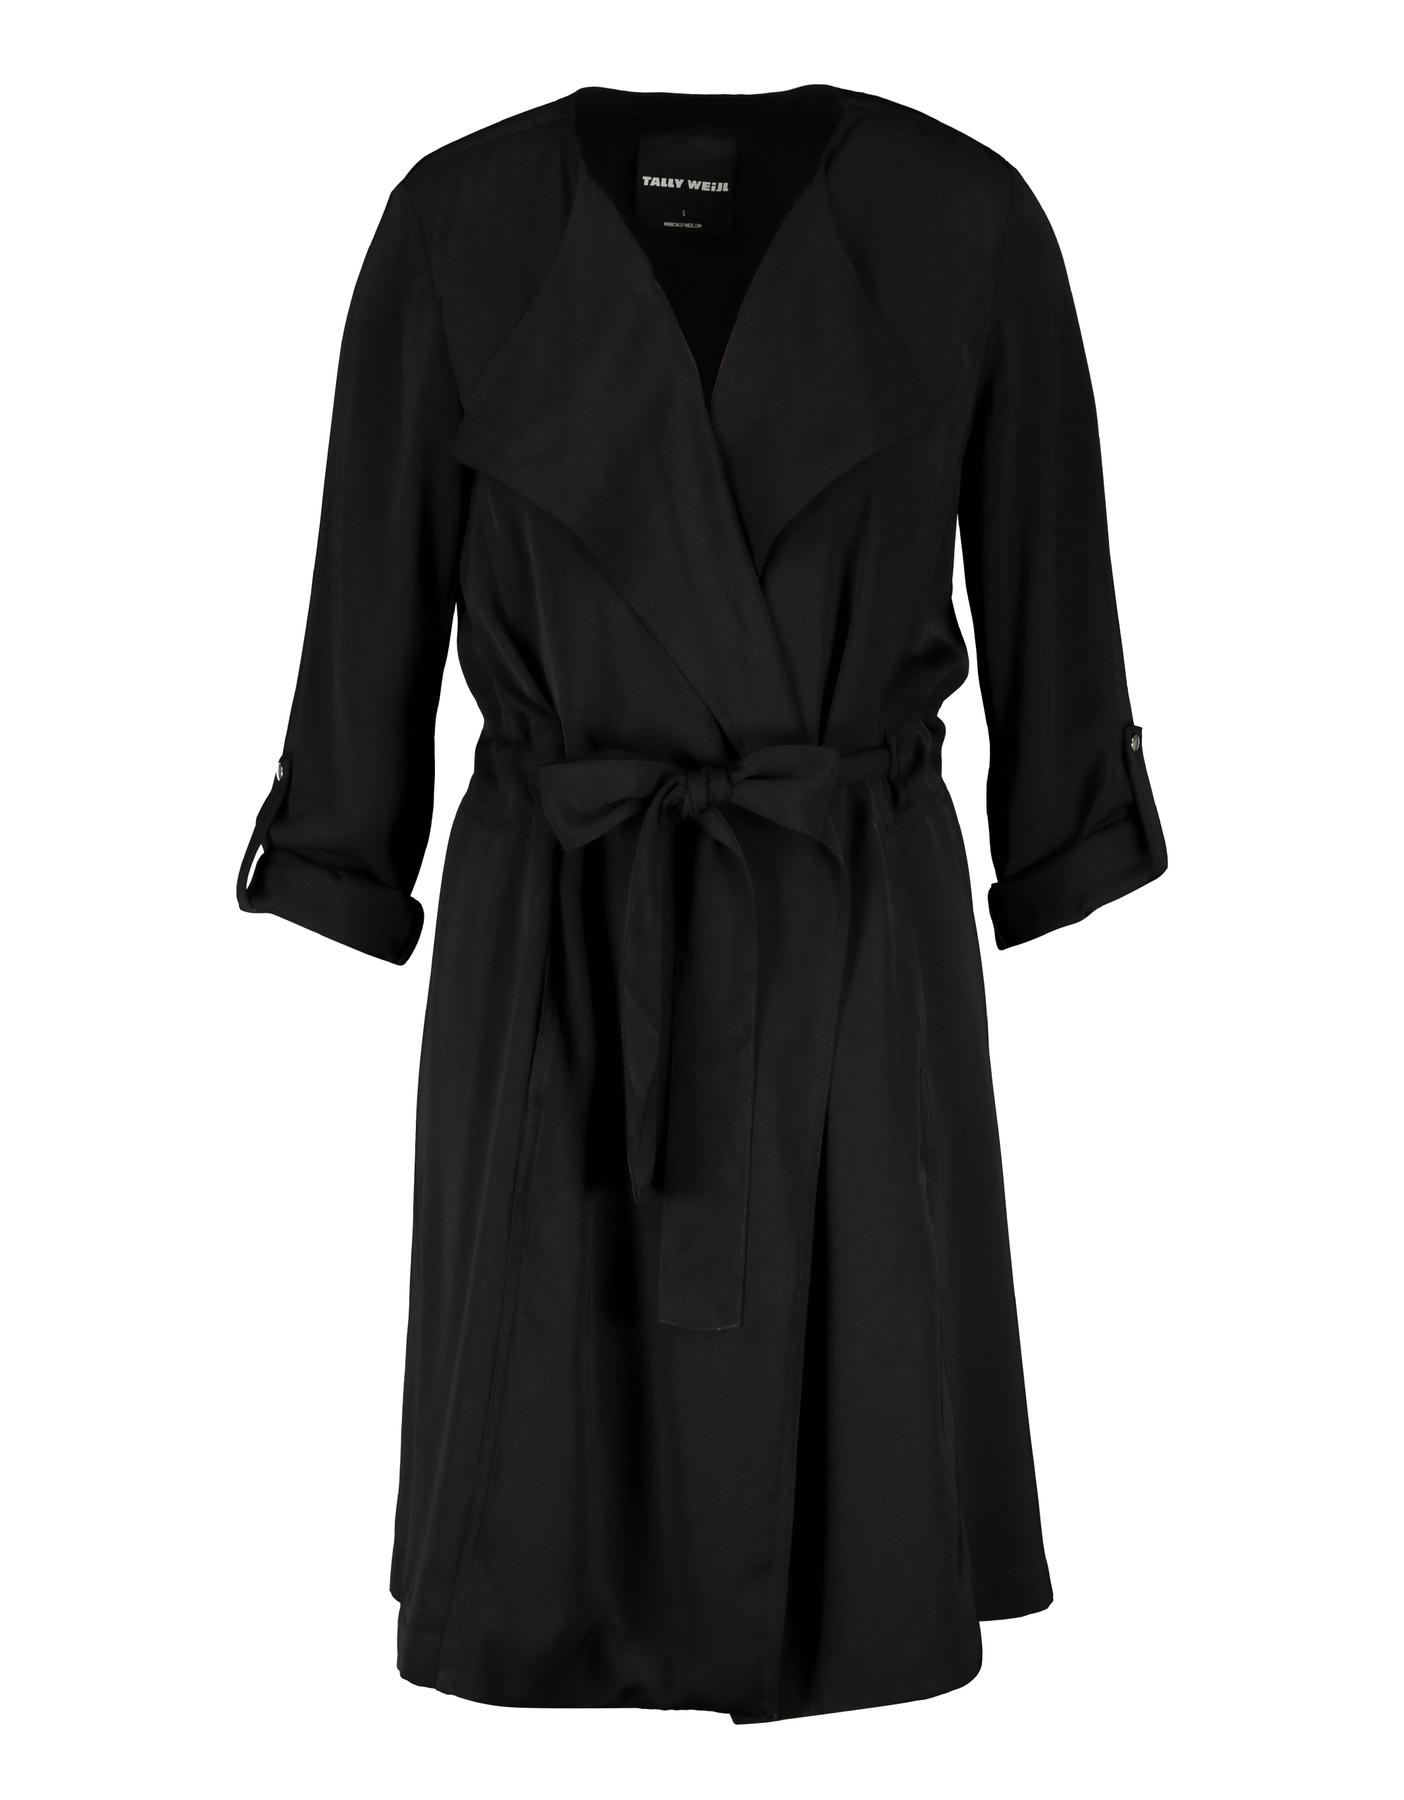 Schwarzer, langer Mantel